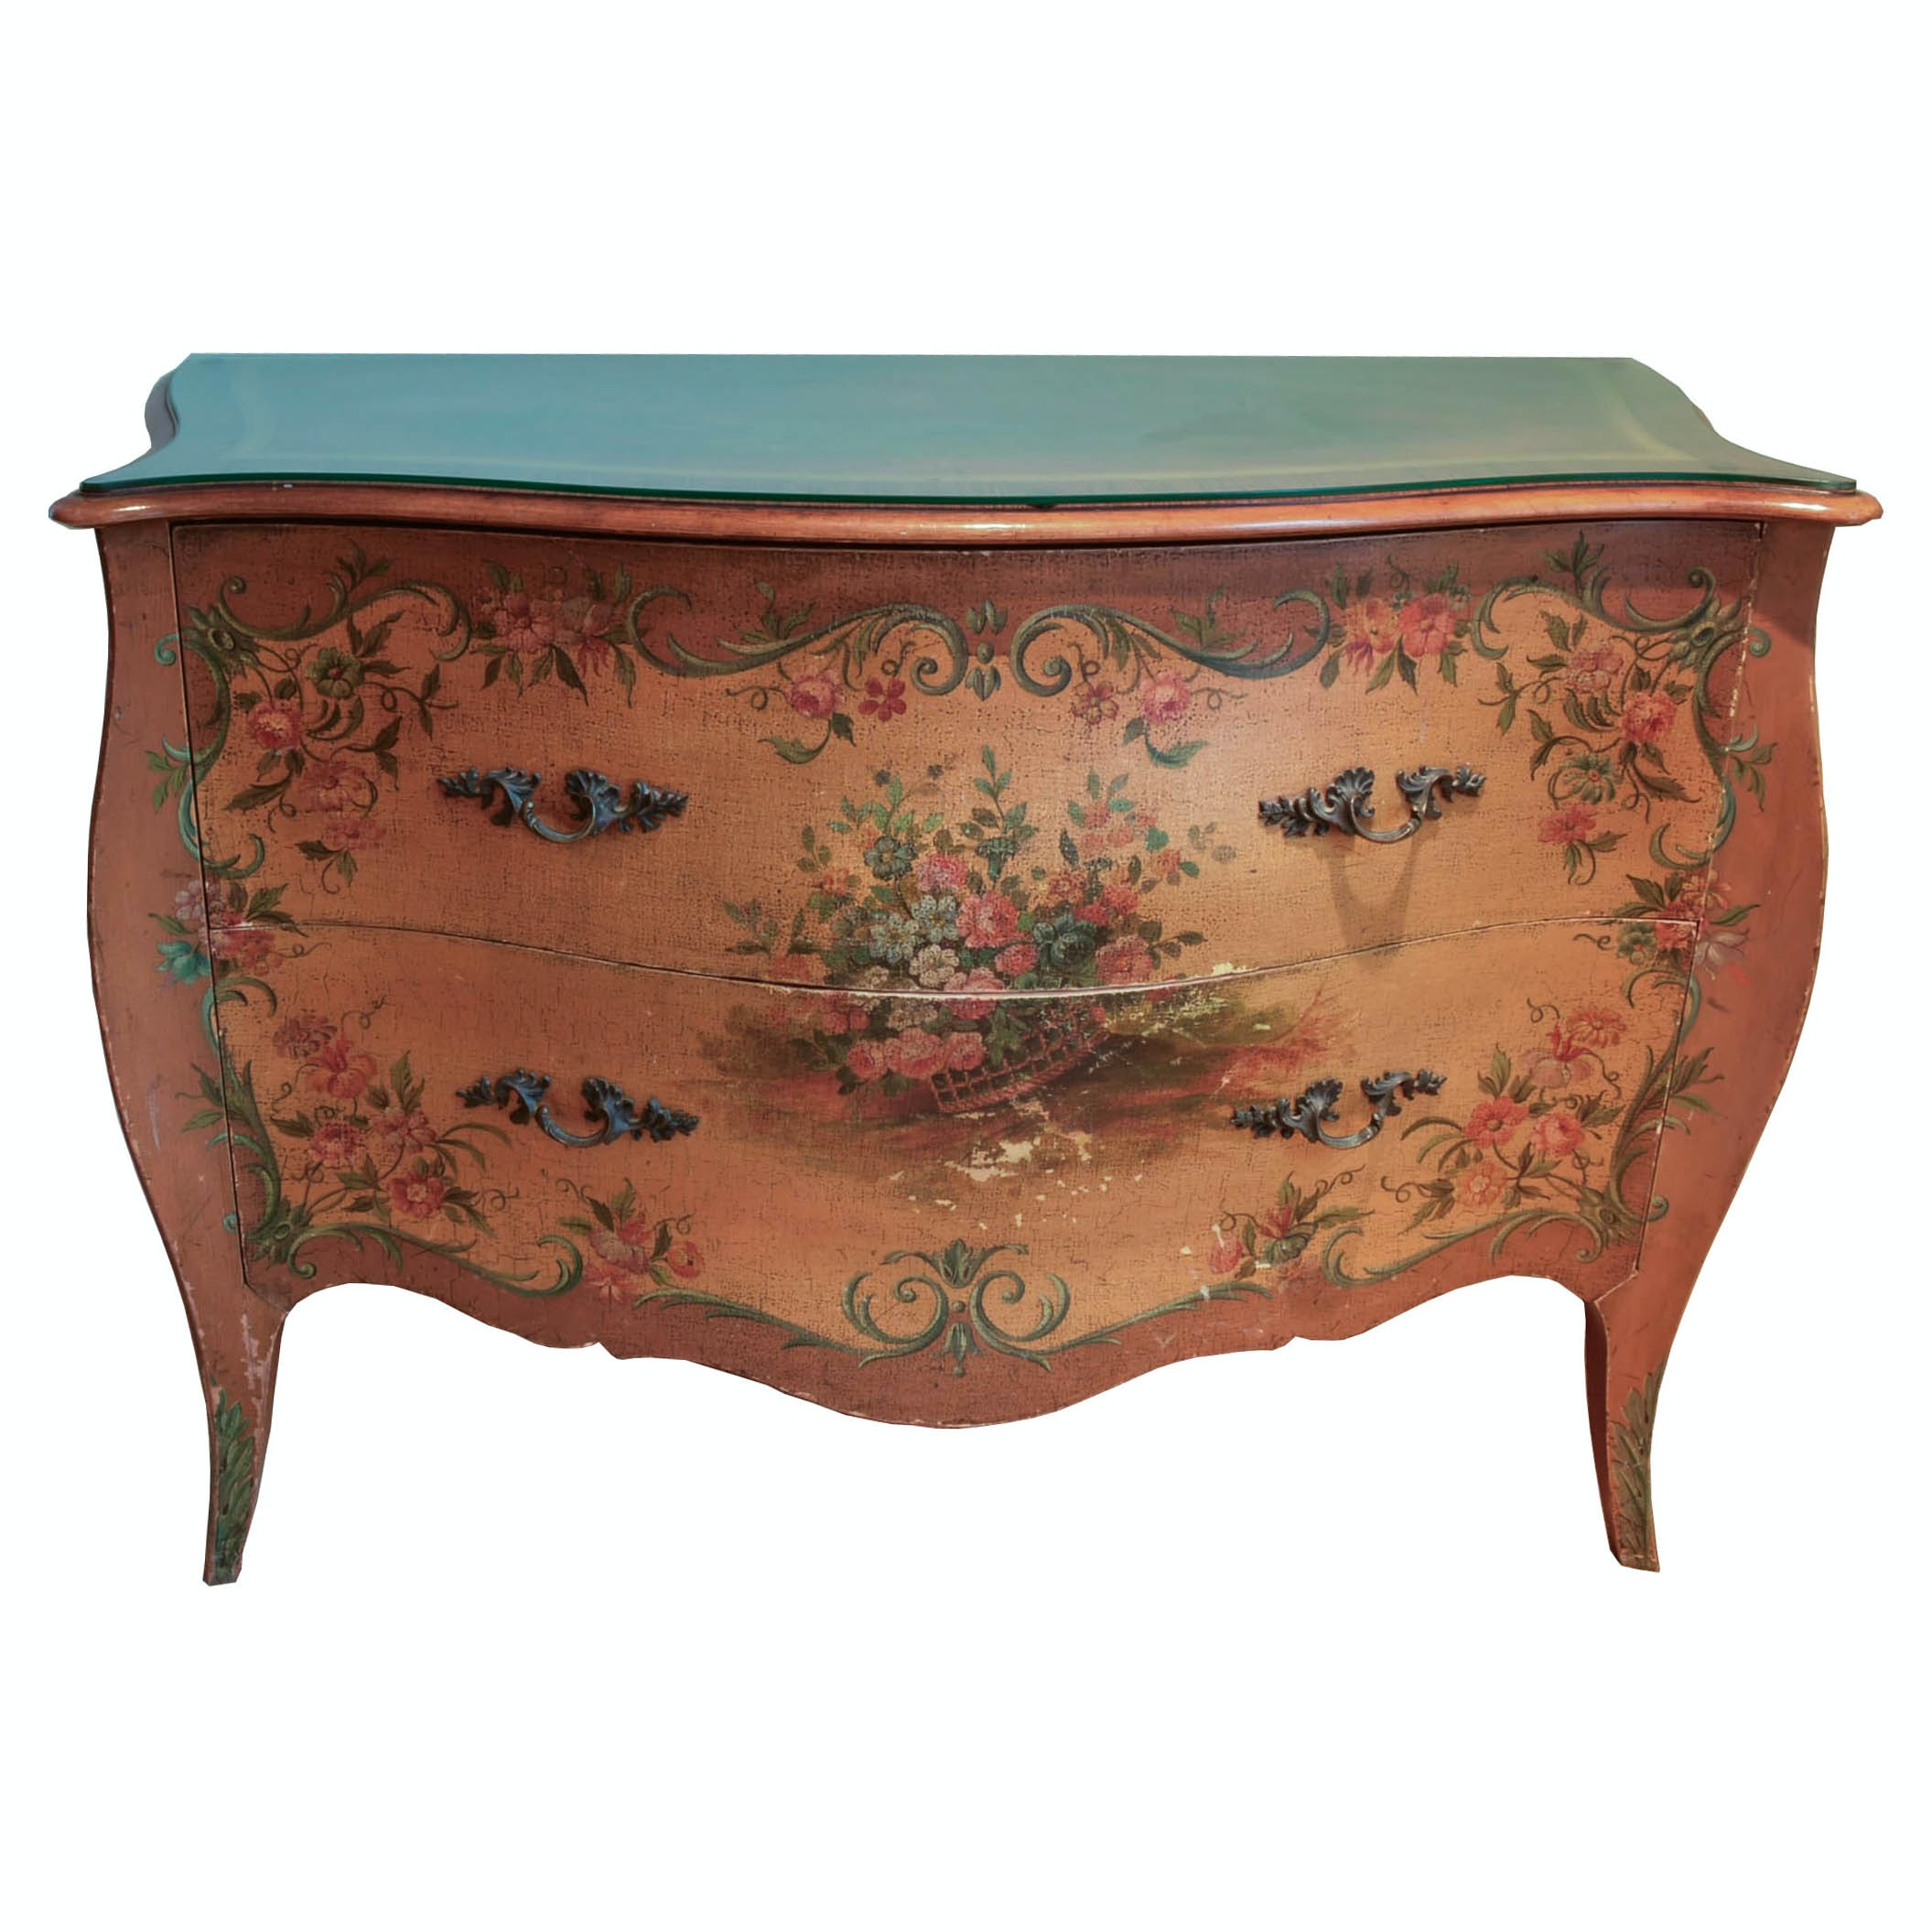 Antique Dresser Made by Robert W. Irwin Company (C.1928)